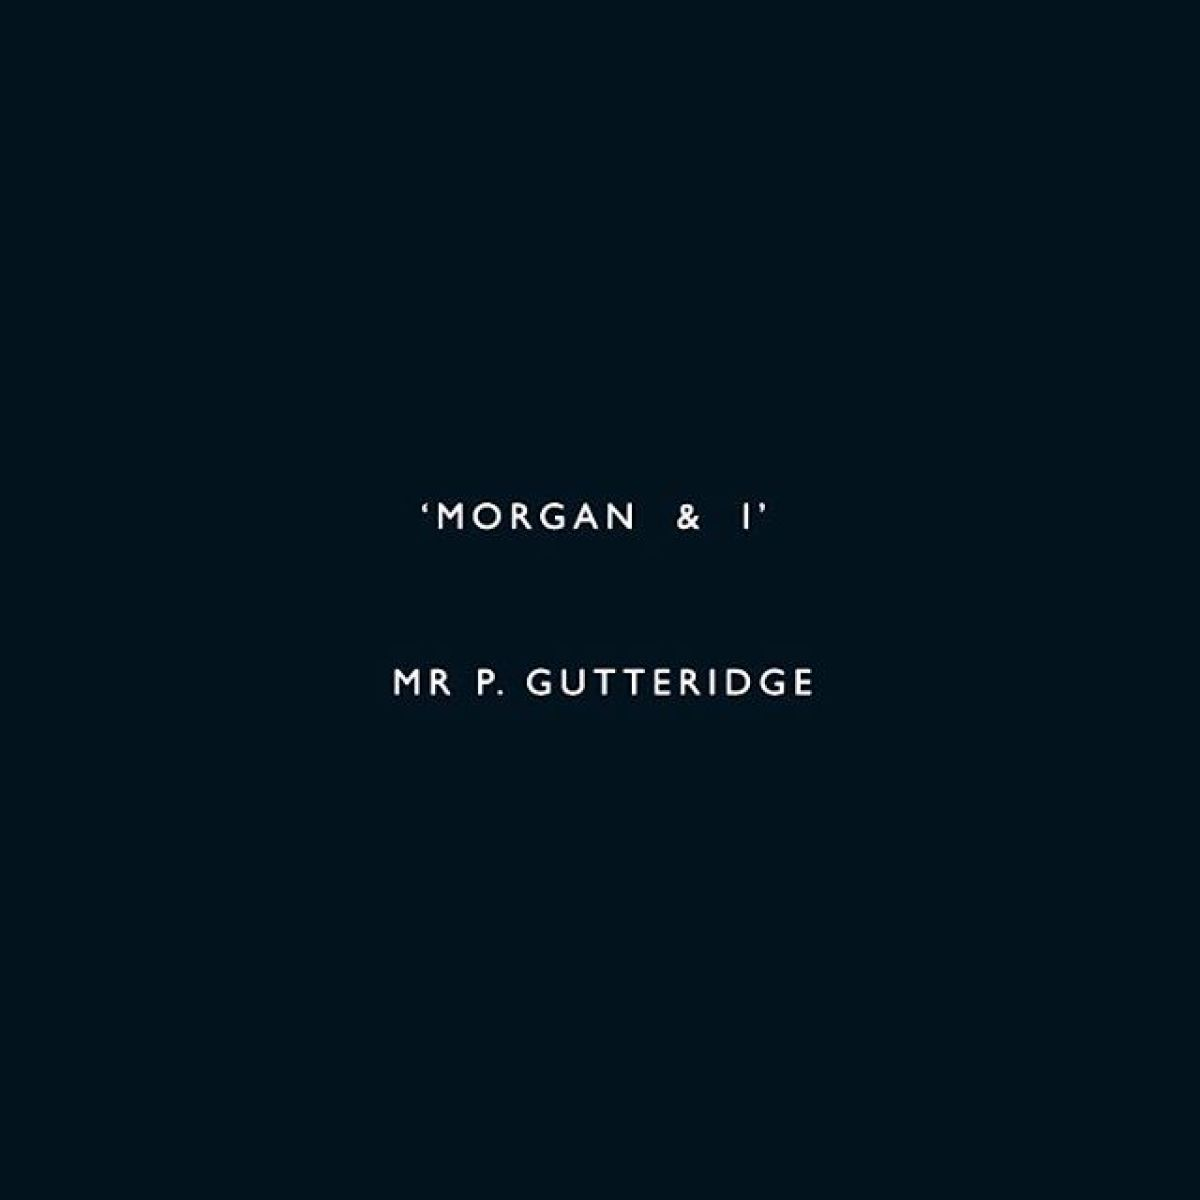 Morgan & I' — Mr P. Gutteridge.Pete is 87 and has kept Morgans since 1952His story - https://vimeo.com/137583187@morganmotor @thelondonmorgan